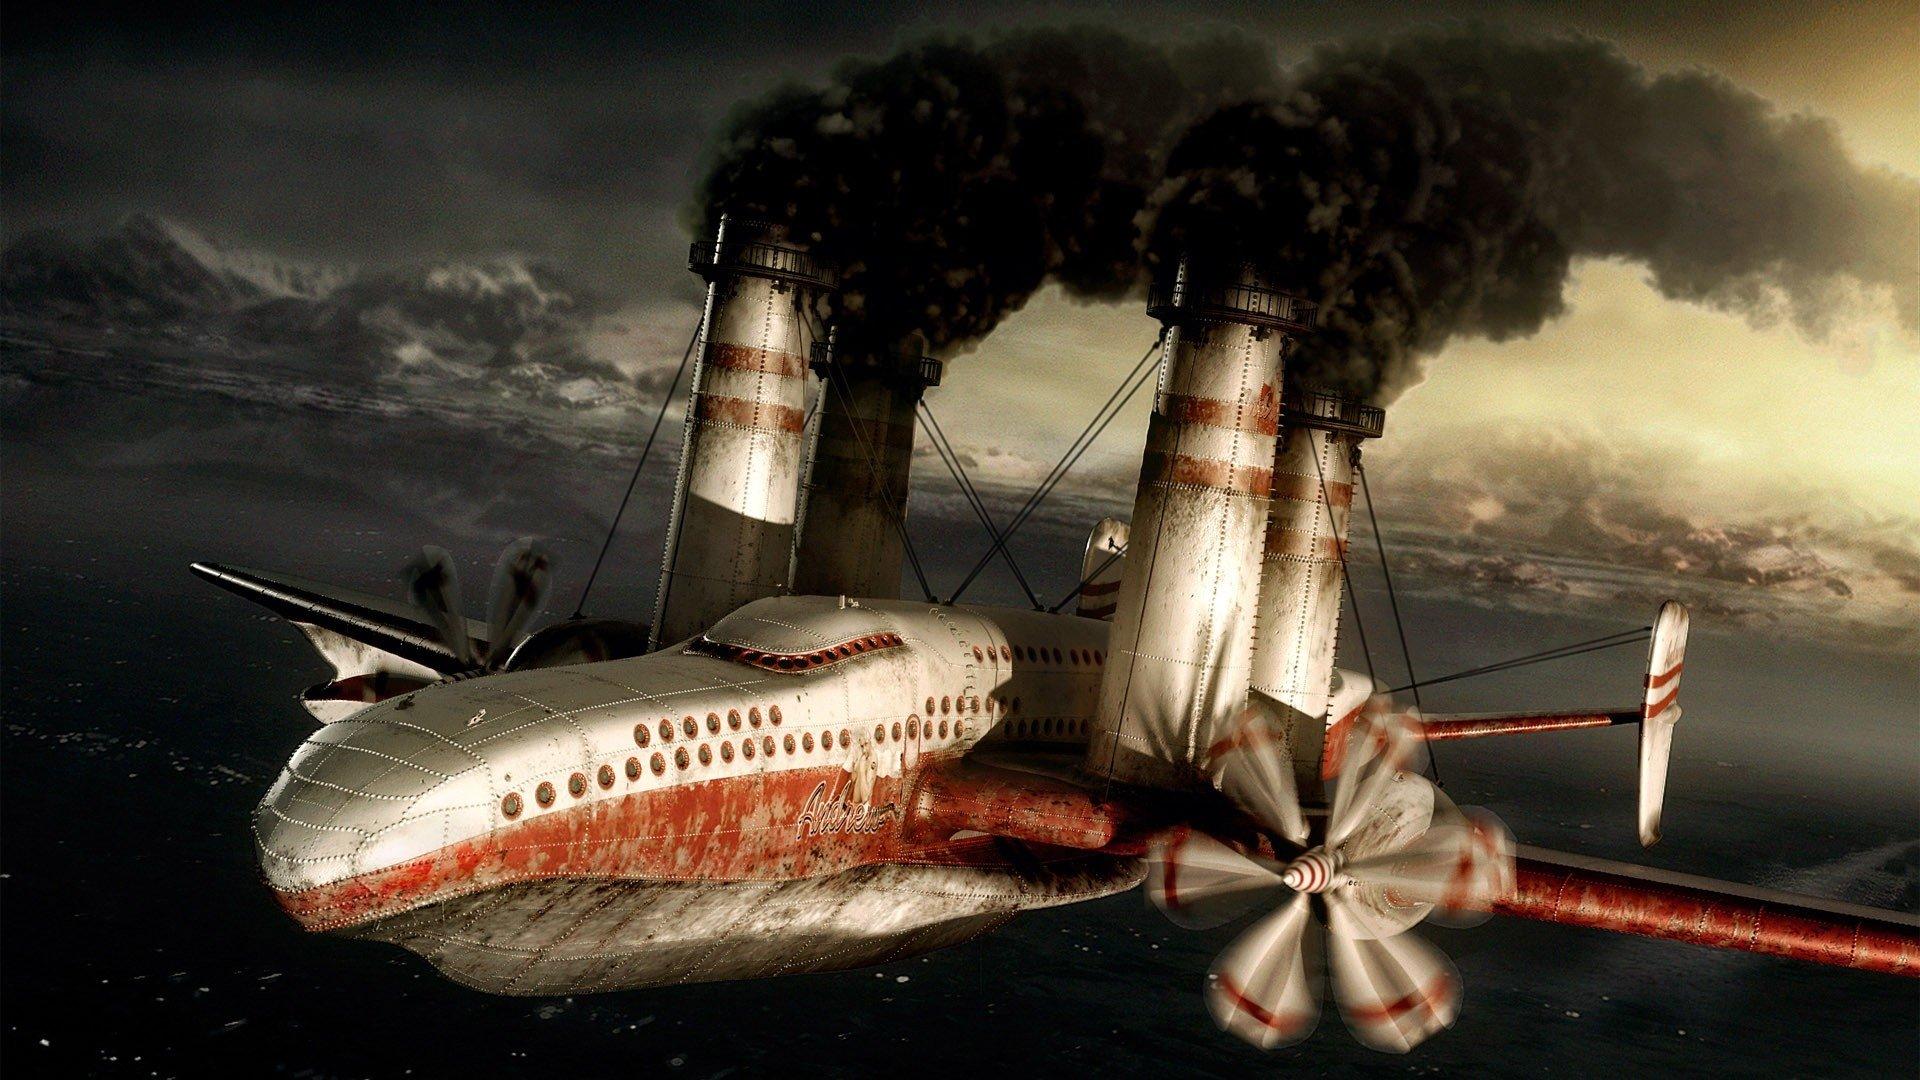 Sci Fi - Steampunk  Airplane Aircraft Wallpaper